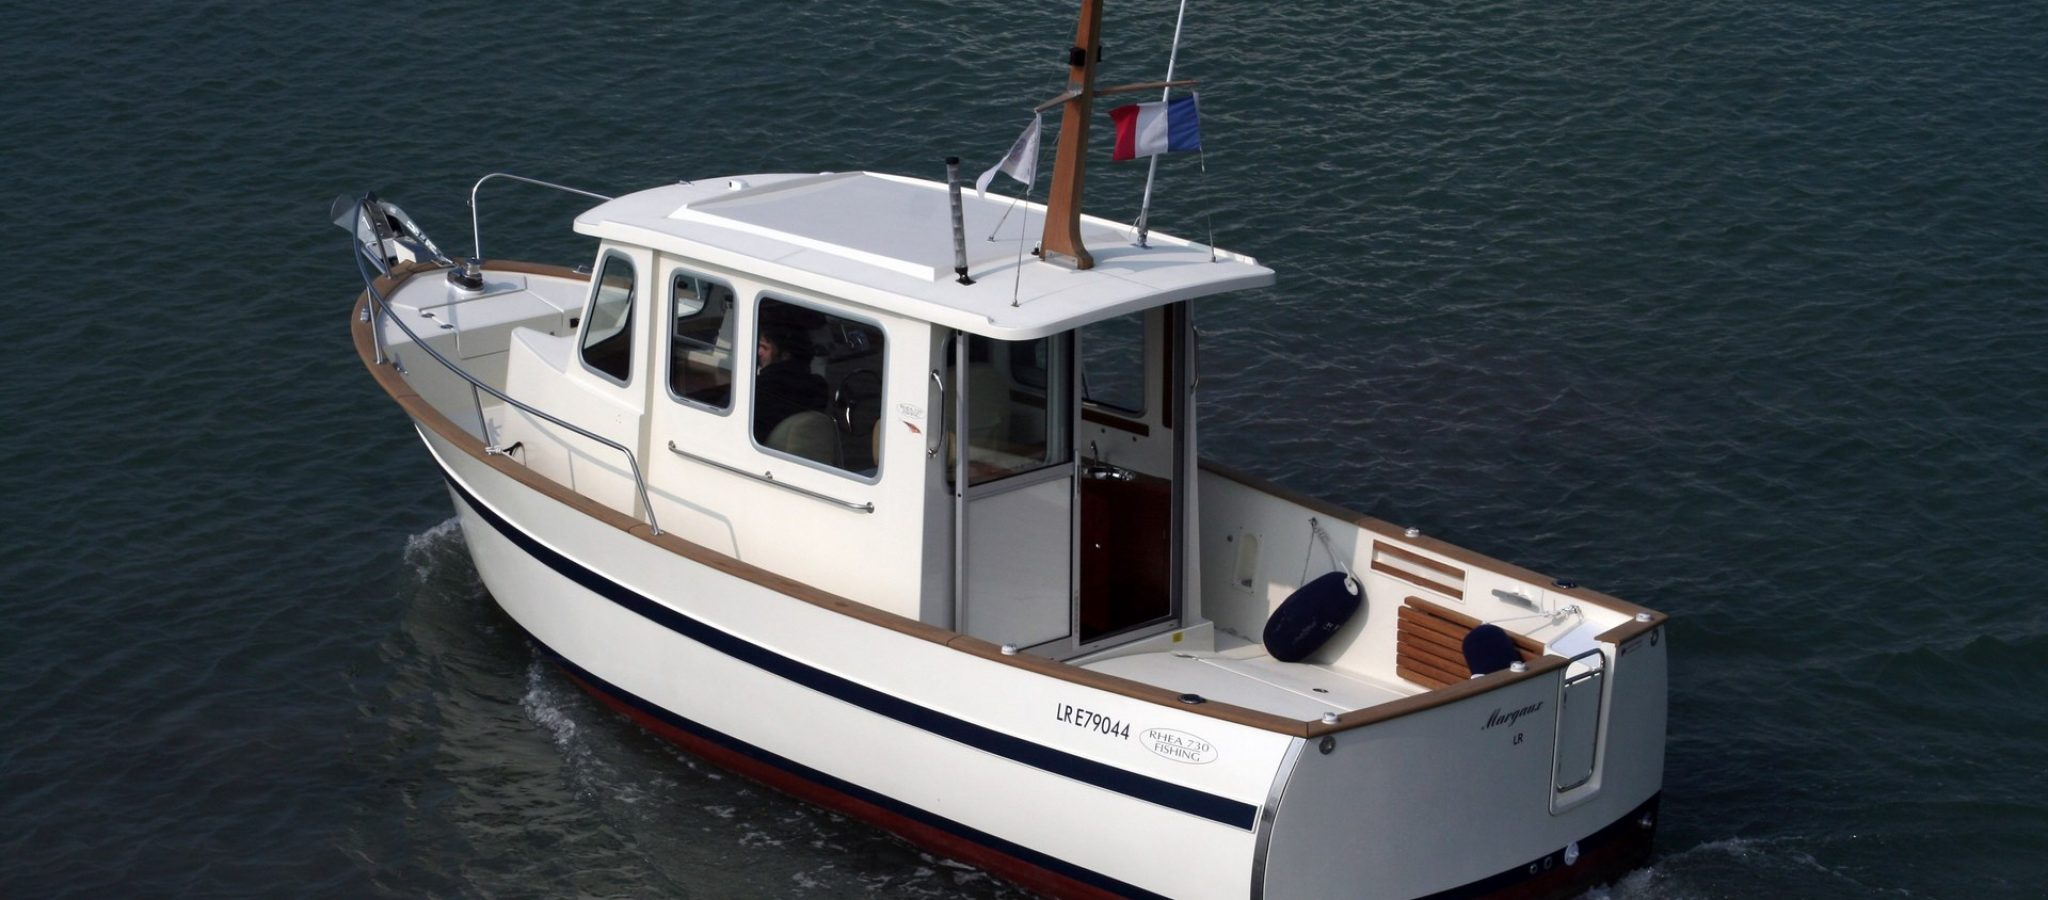 Rhéa-marine-730timonier (5)web (1)